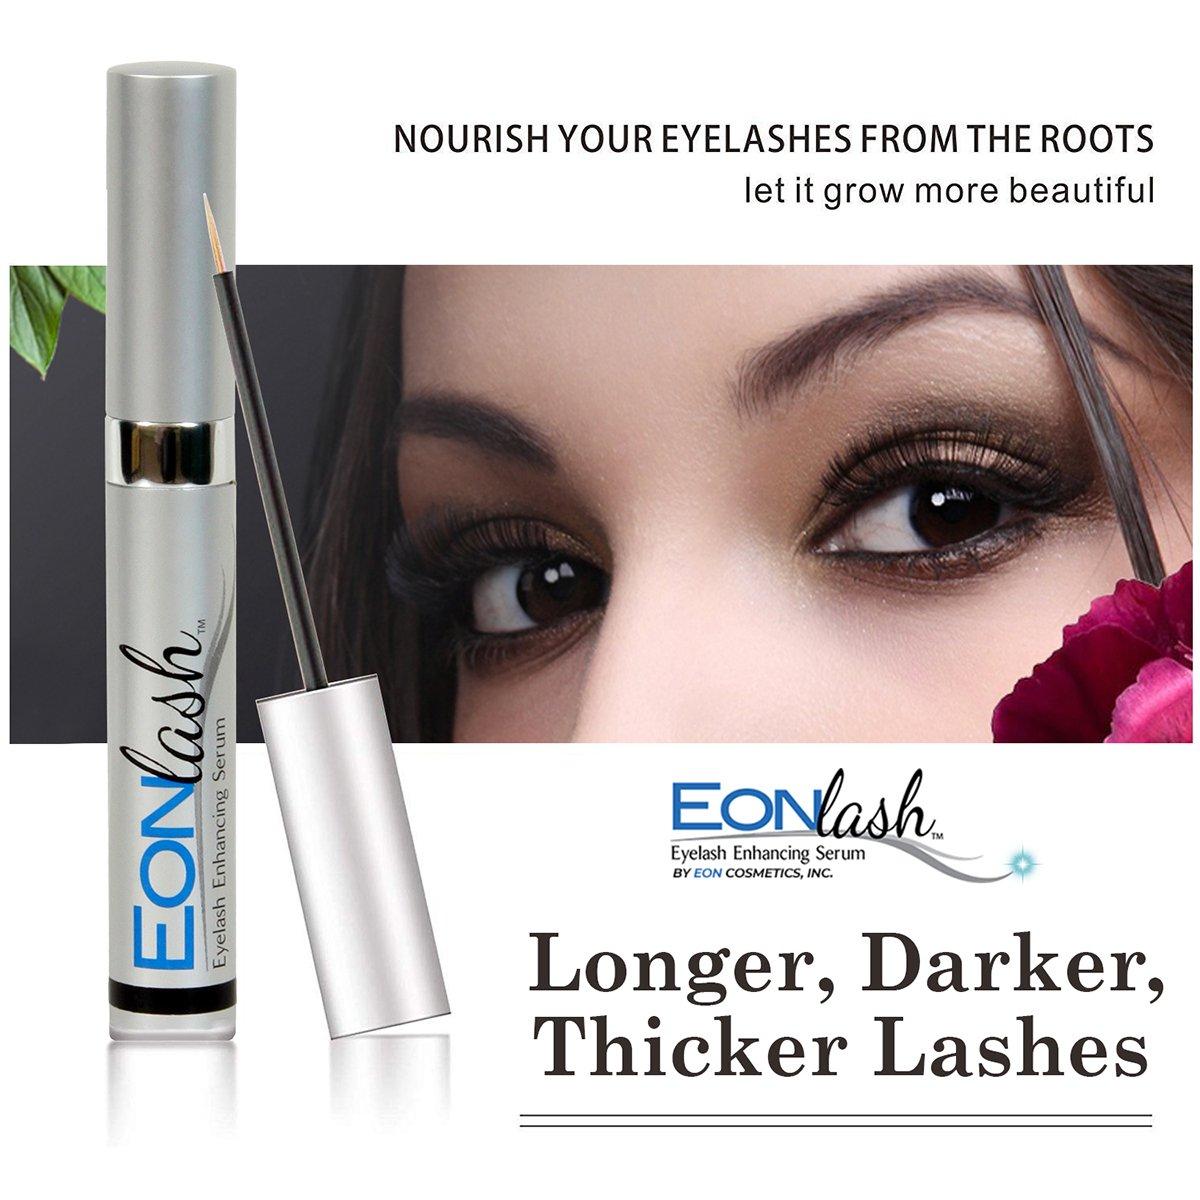 15234887409 ... #naturallashes Apply #eonLash daily for best results #lashesfordays # lashes #eyelashqueen #lashesonfleek #beautyserum #makeuppic.twitter .com/5coBucfwIU